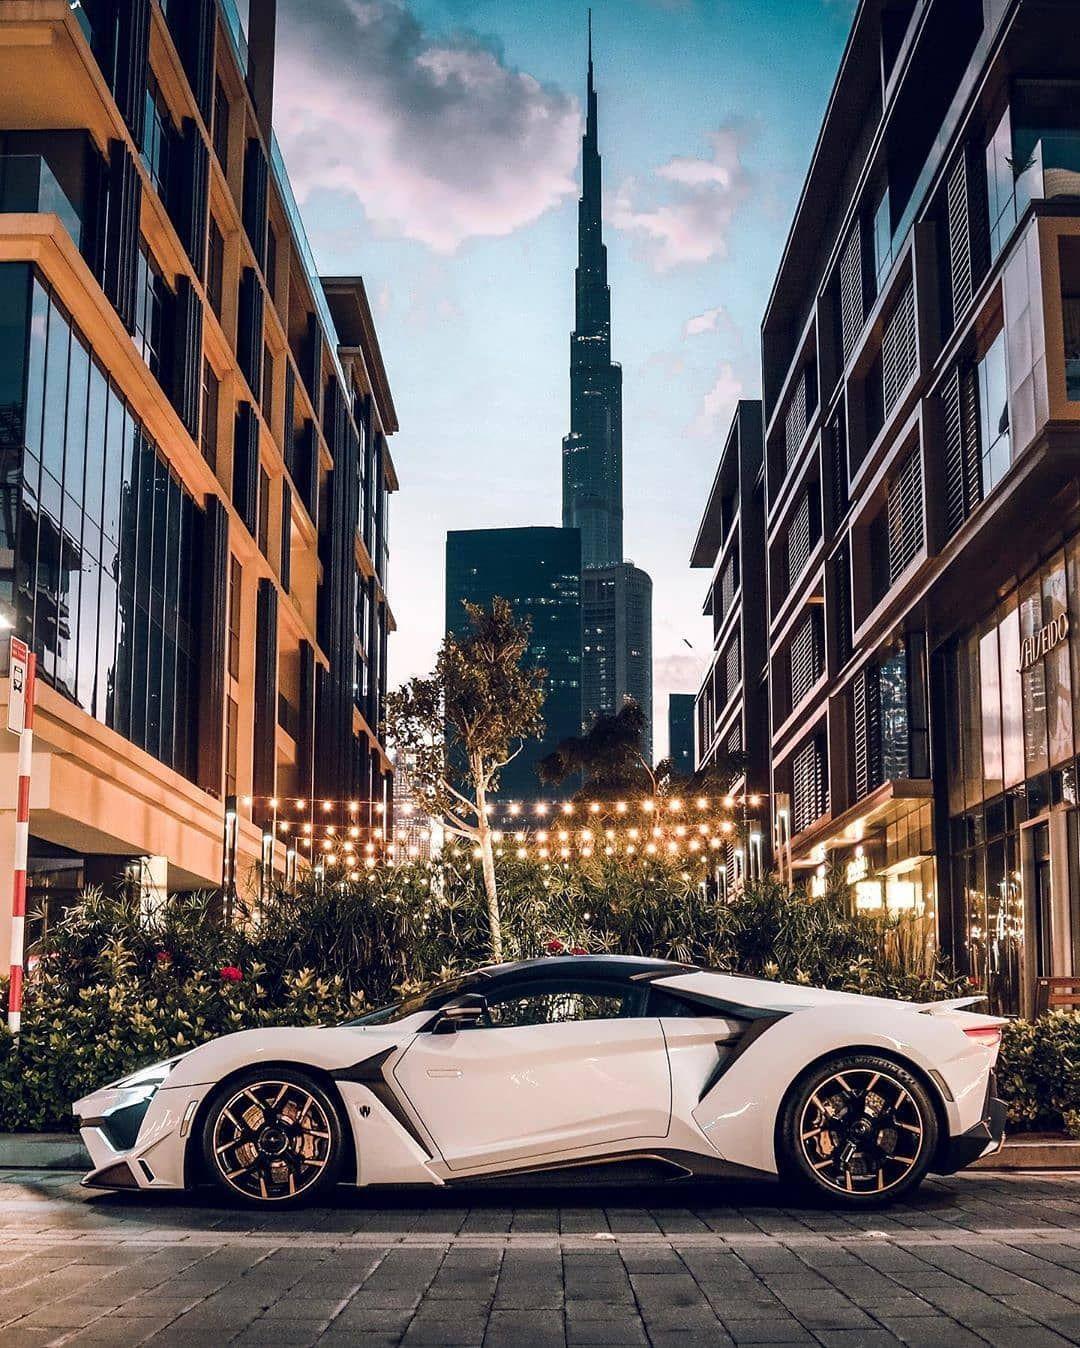 W I L D D U B A I In 2020 Amazing Cars Lykan Hypersport Luxury Cars